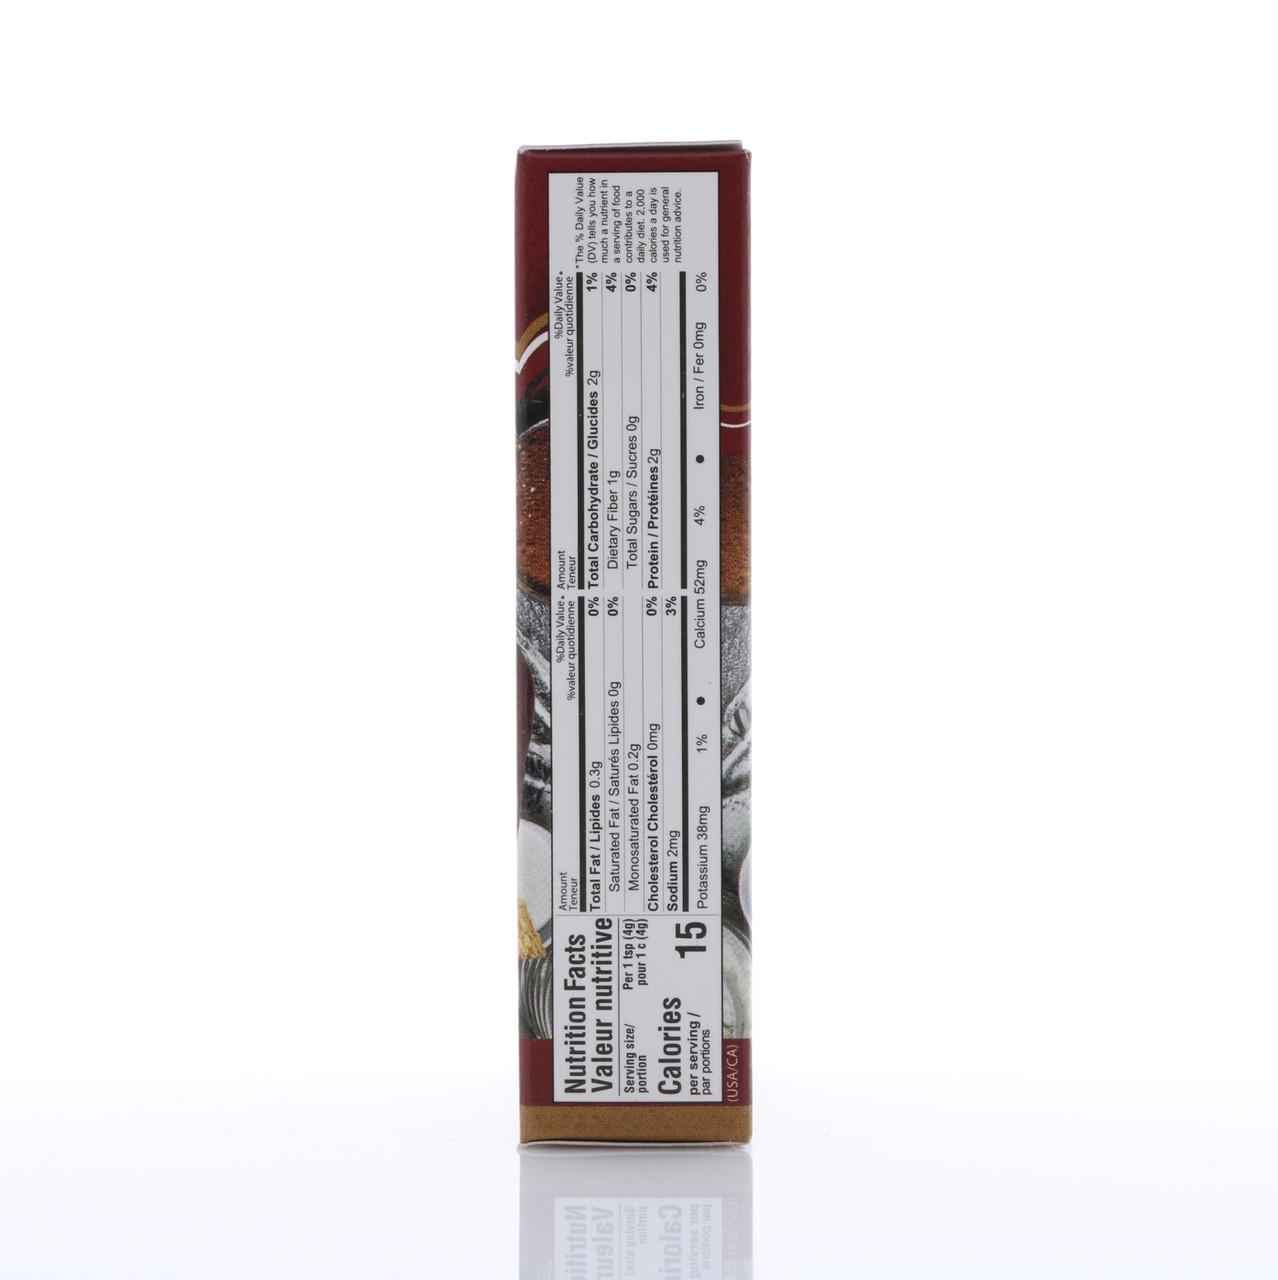 Sale Instant Yeast 33g Hemani General Trading